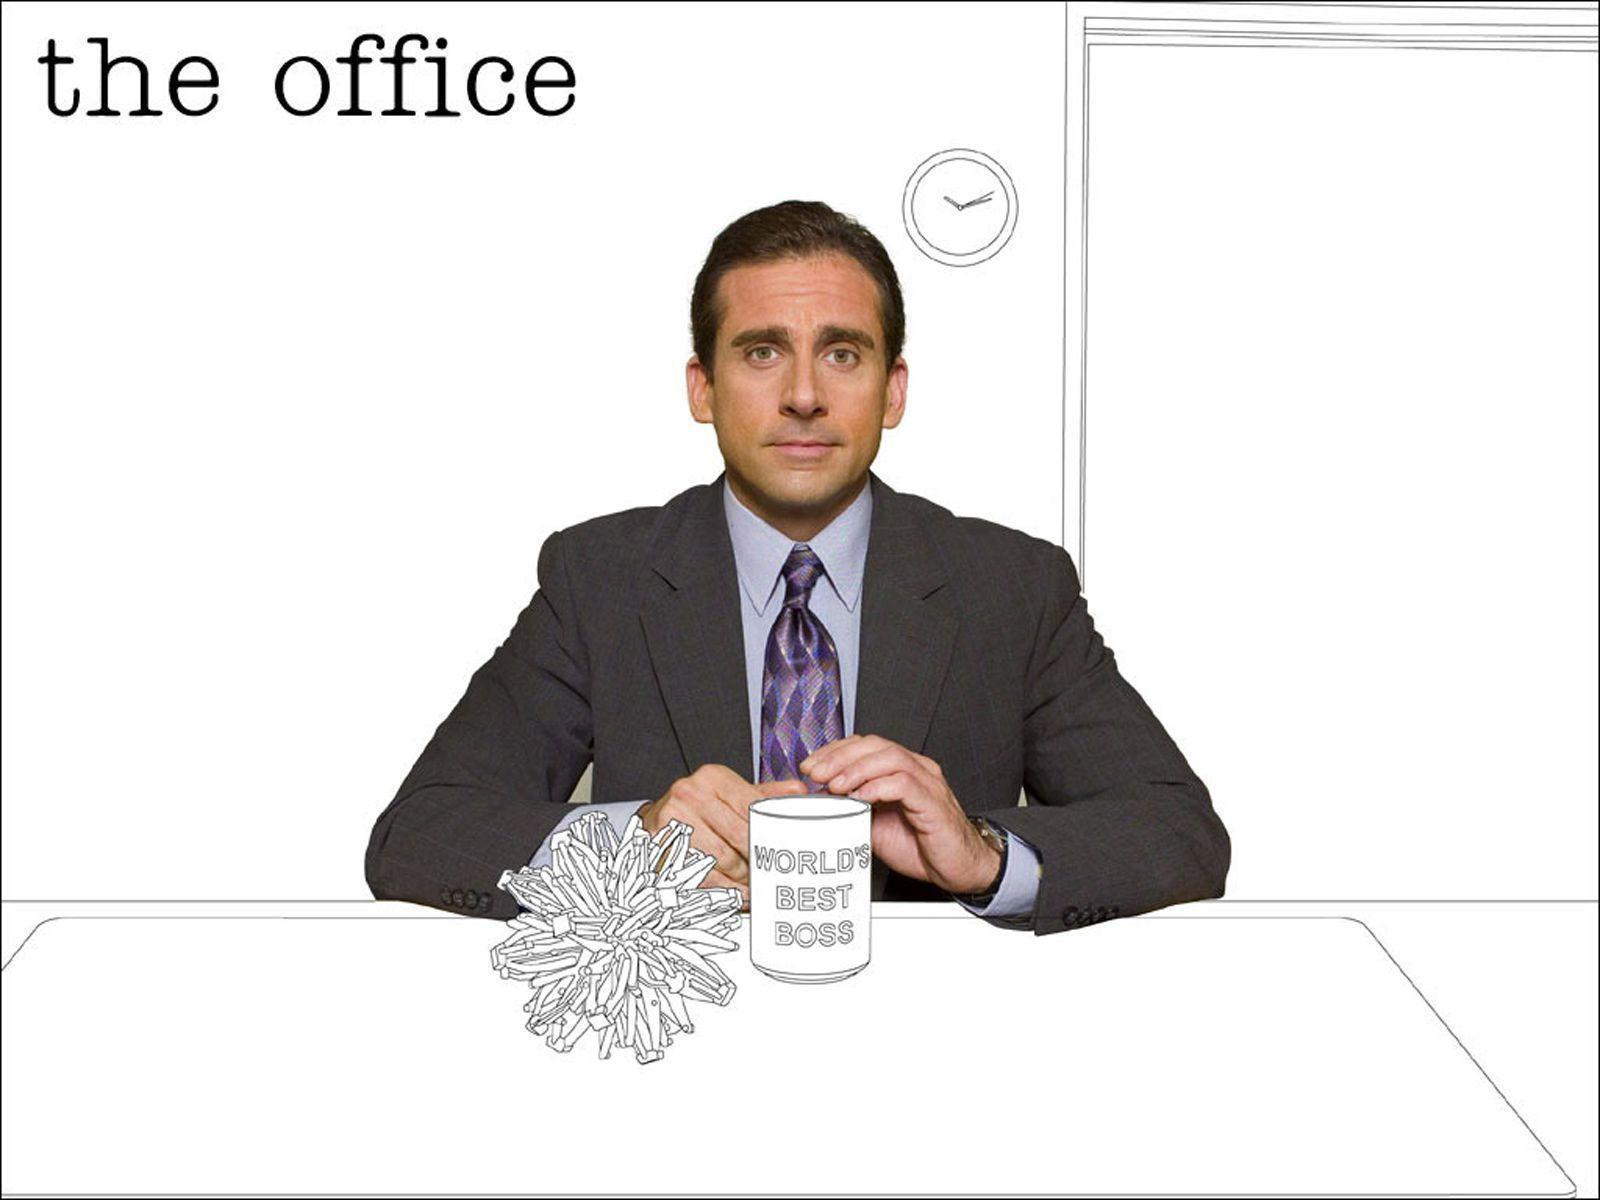 The Office Desktop Wallpapers - Wallpaper Cave